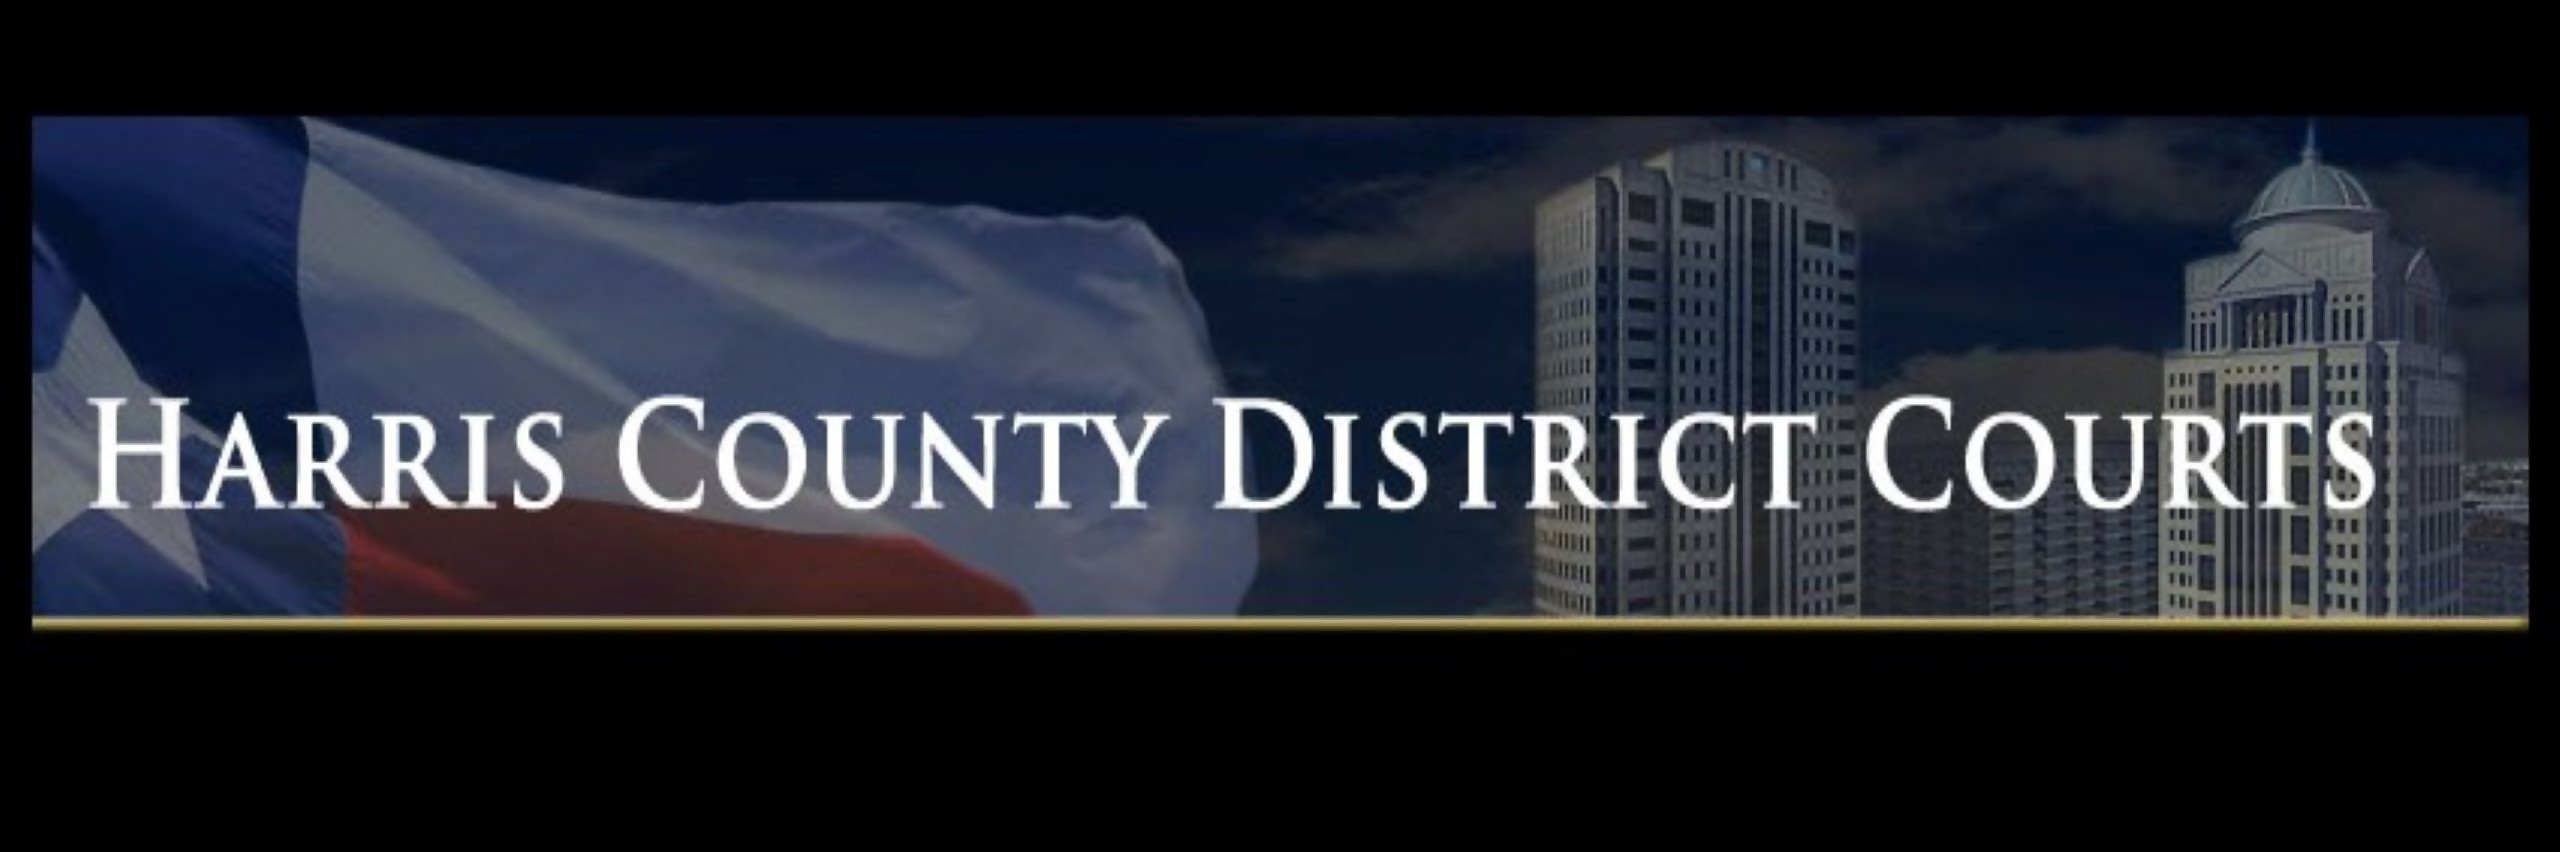 270th District Court - Live Stream